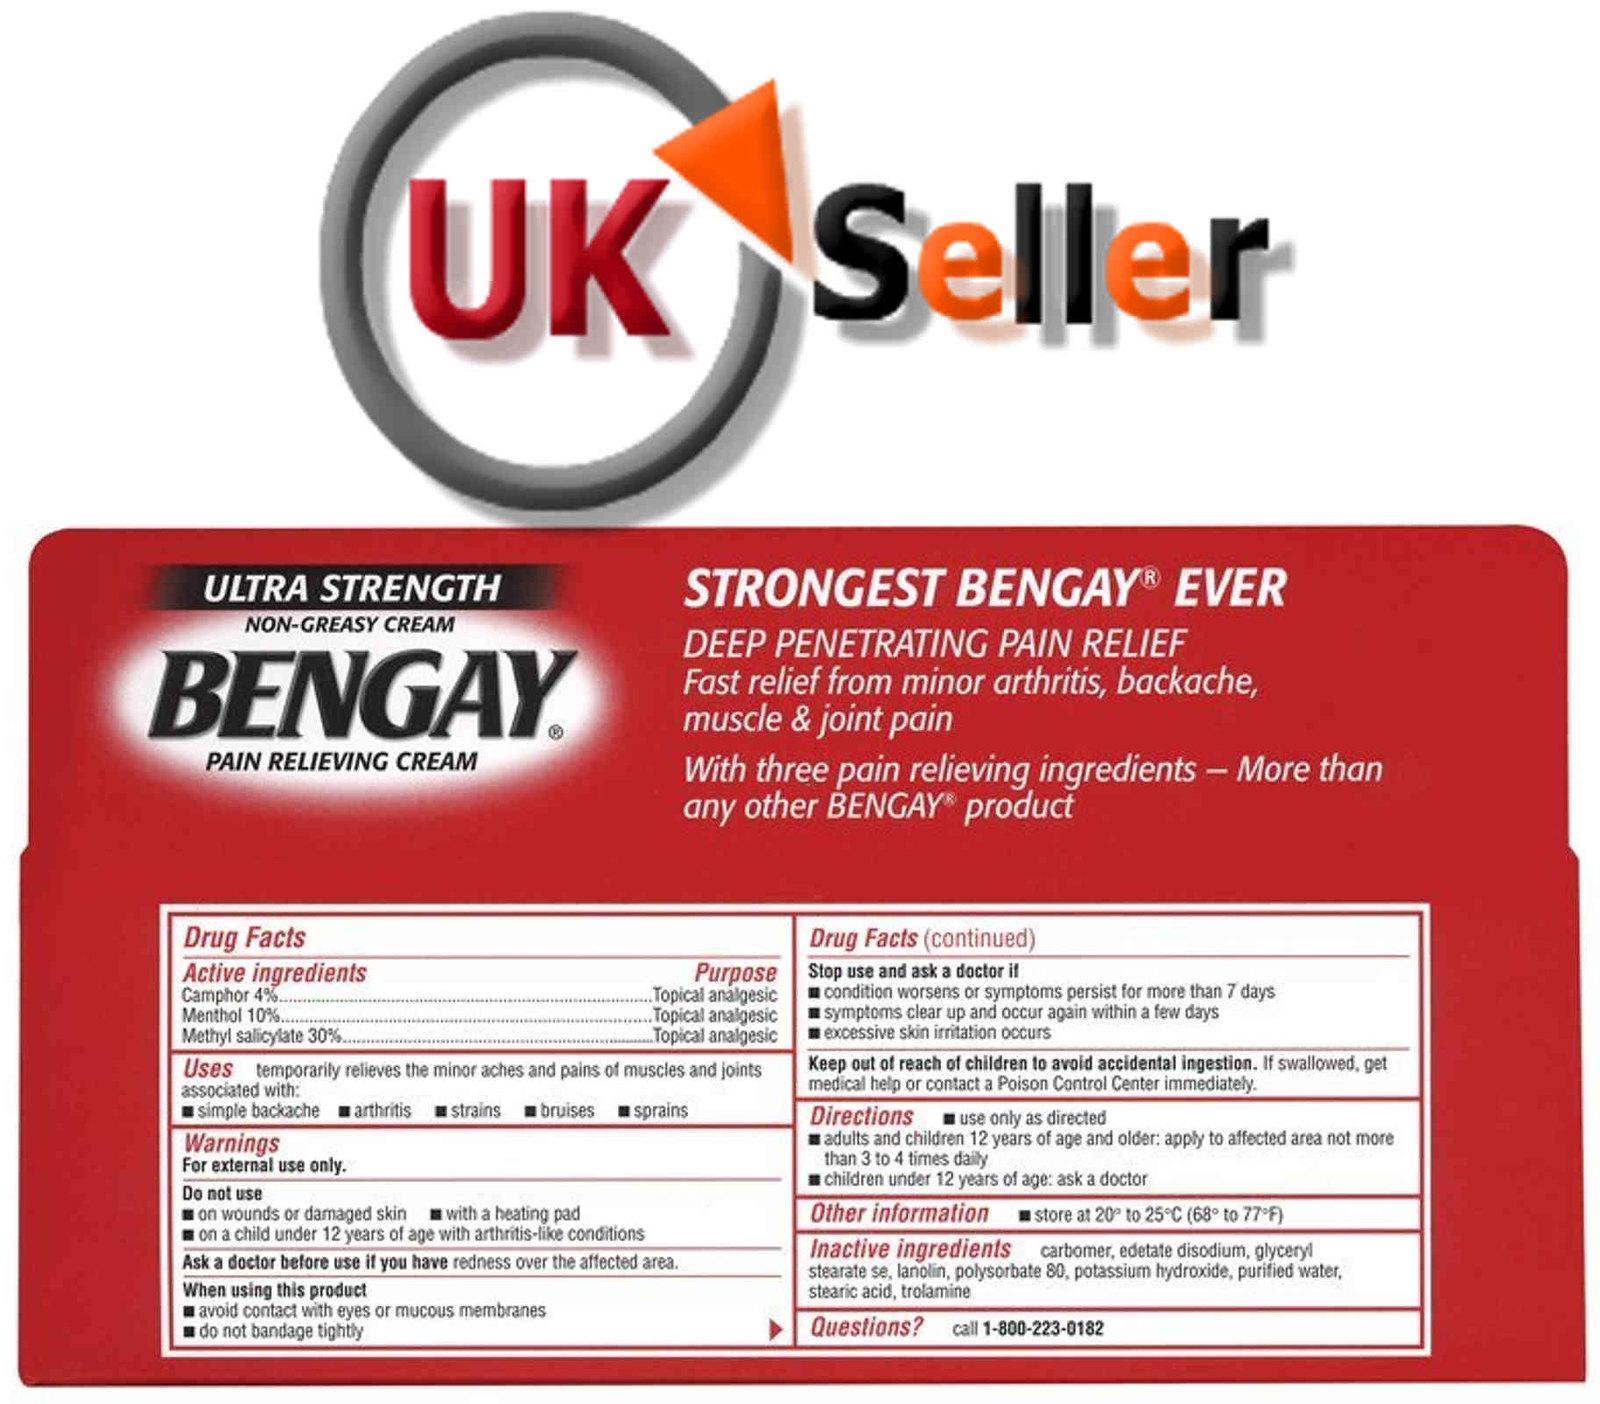 Bengay directions